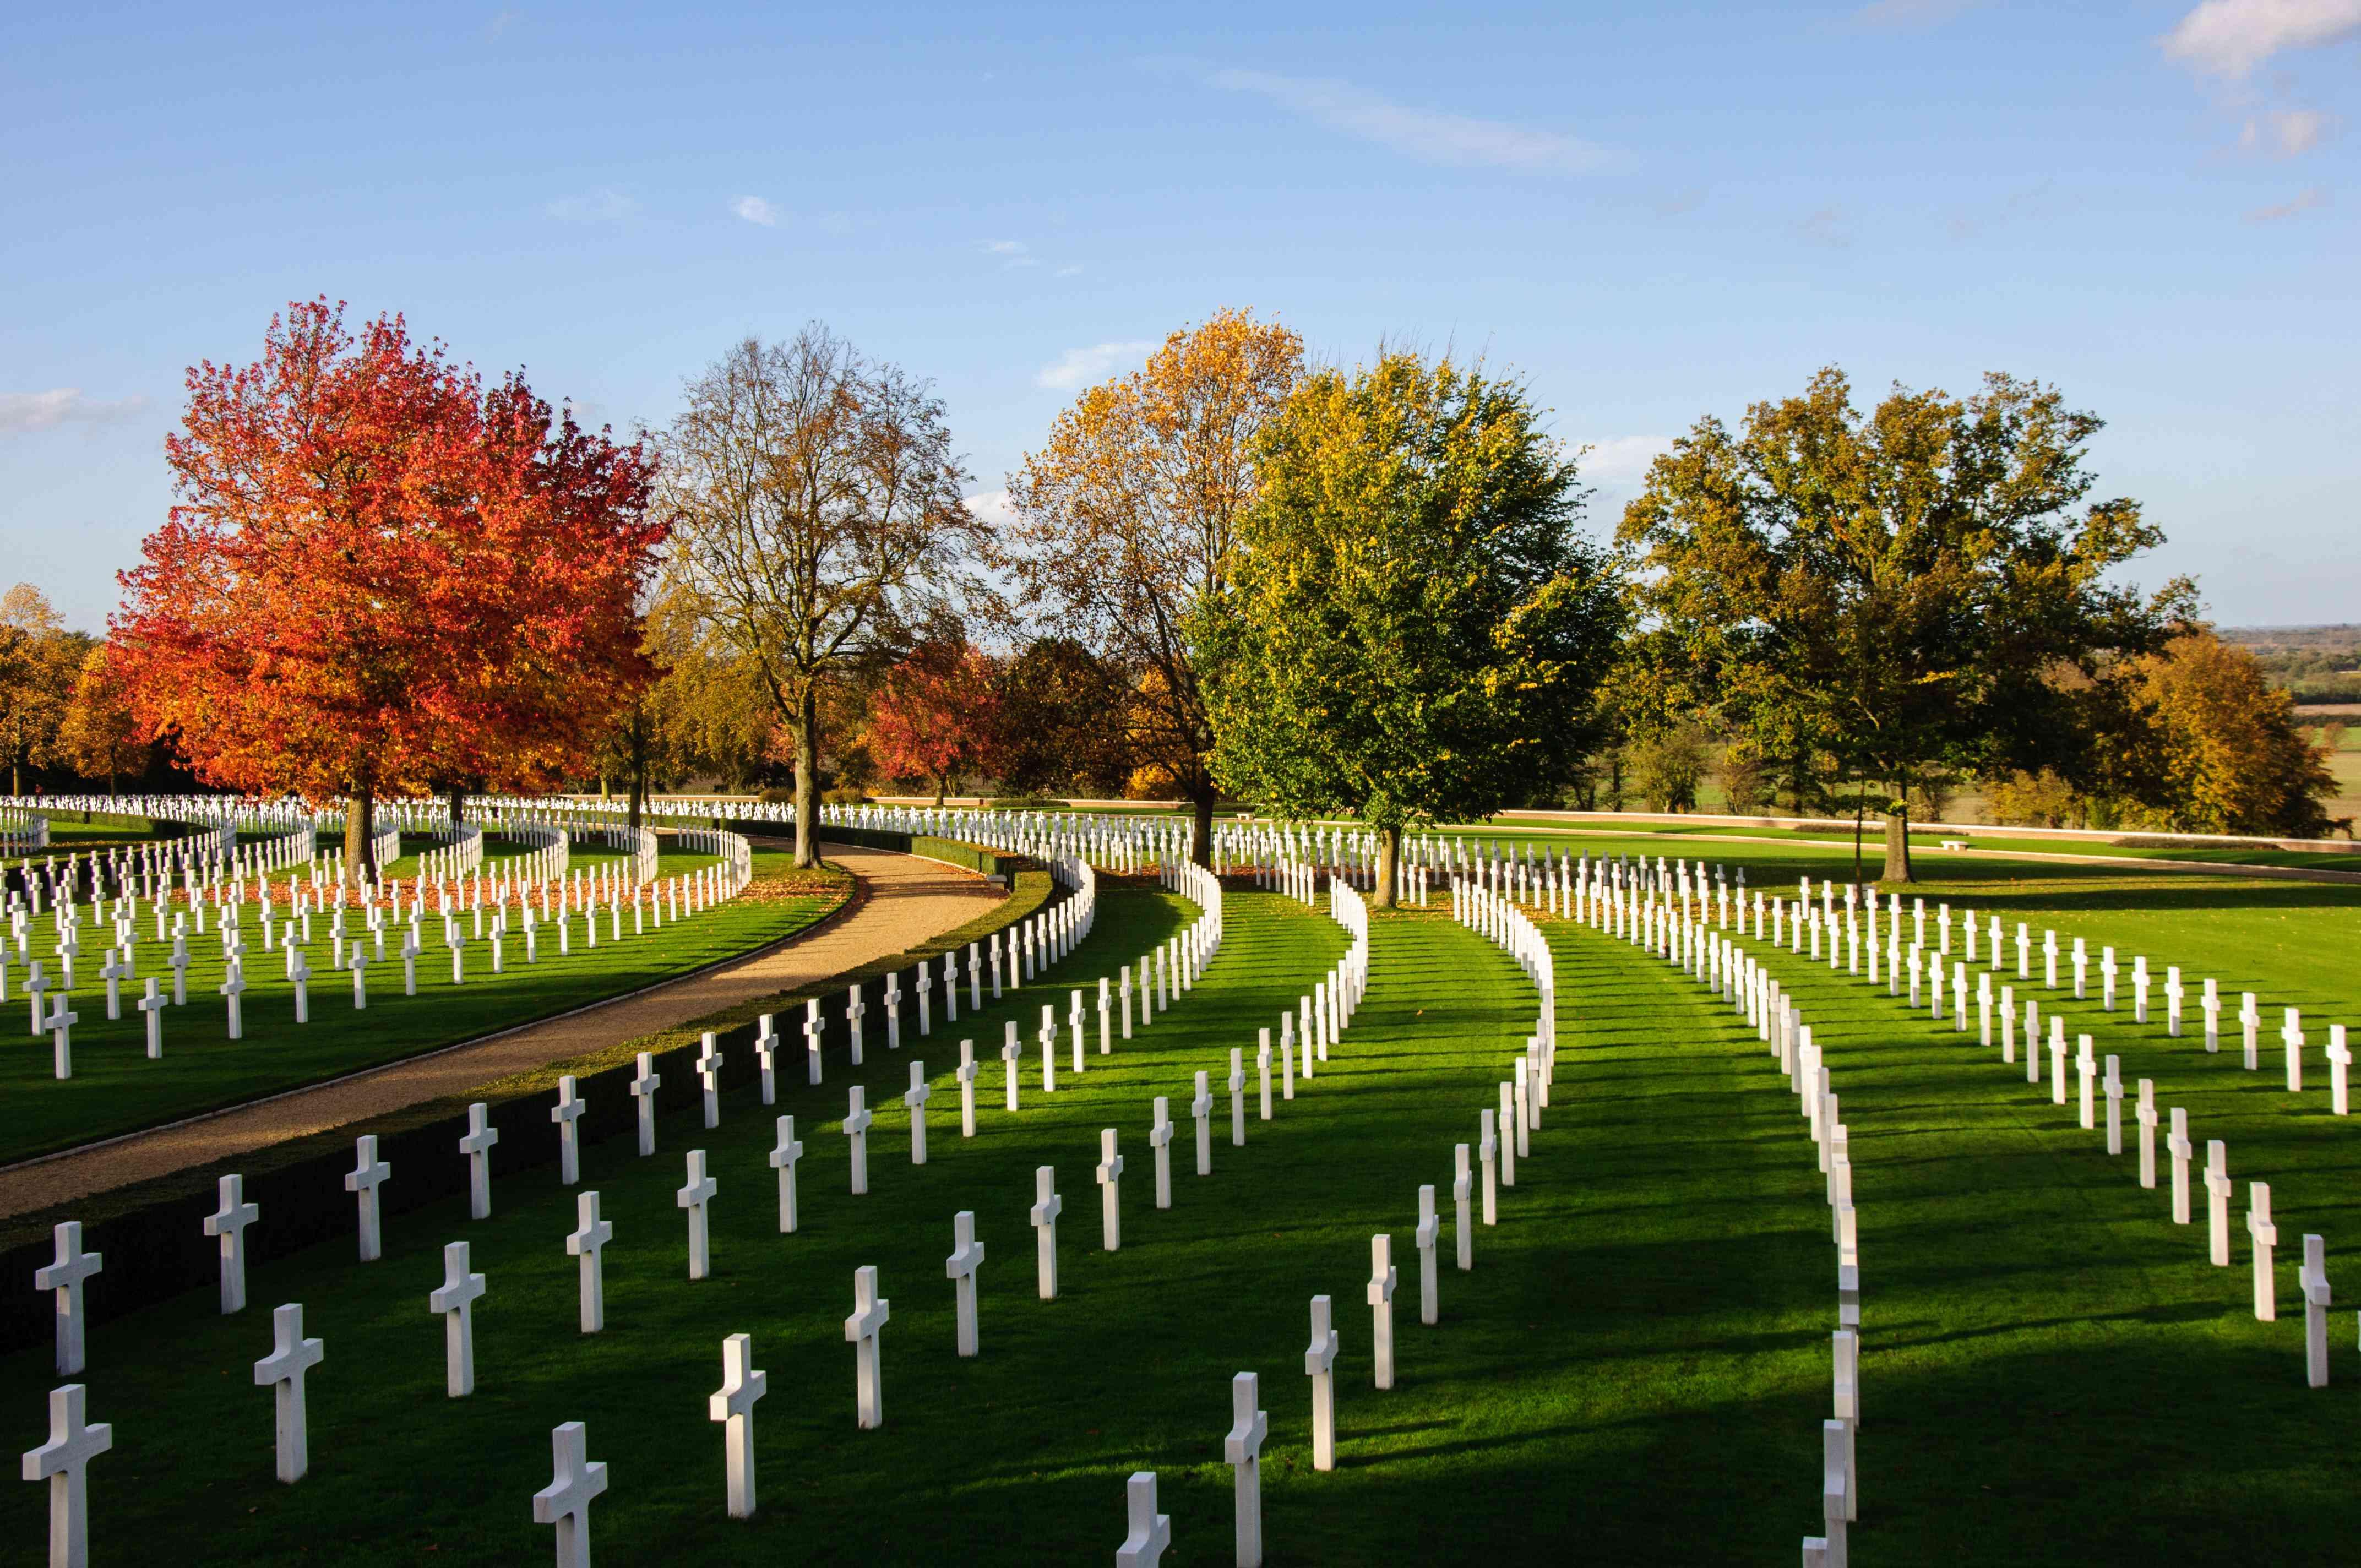 Madingley American Cemetery